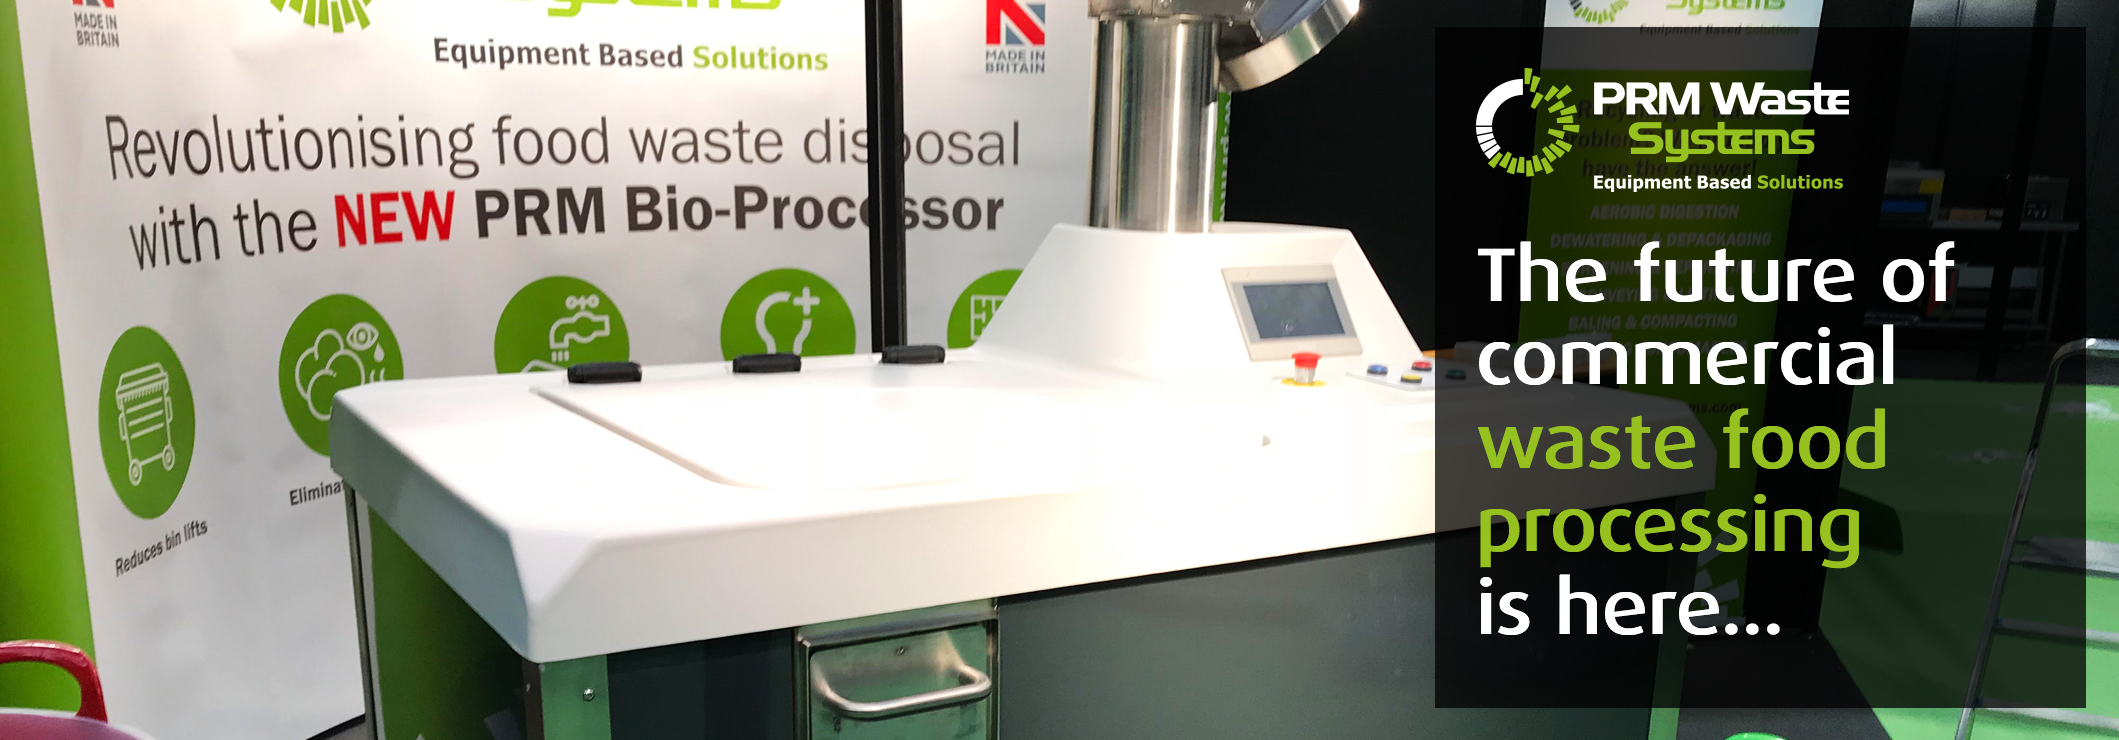 waste food processing